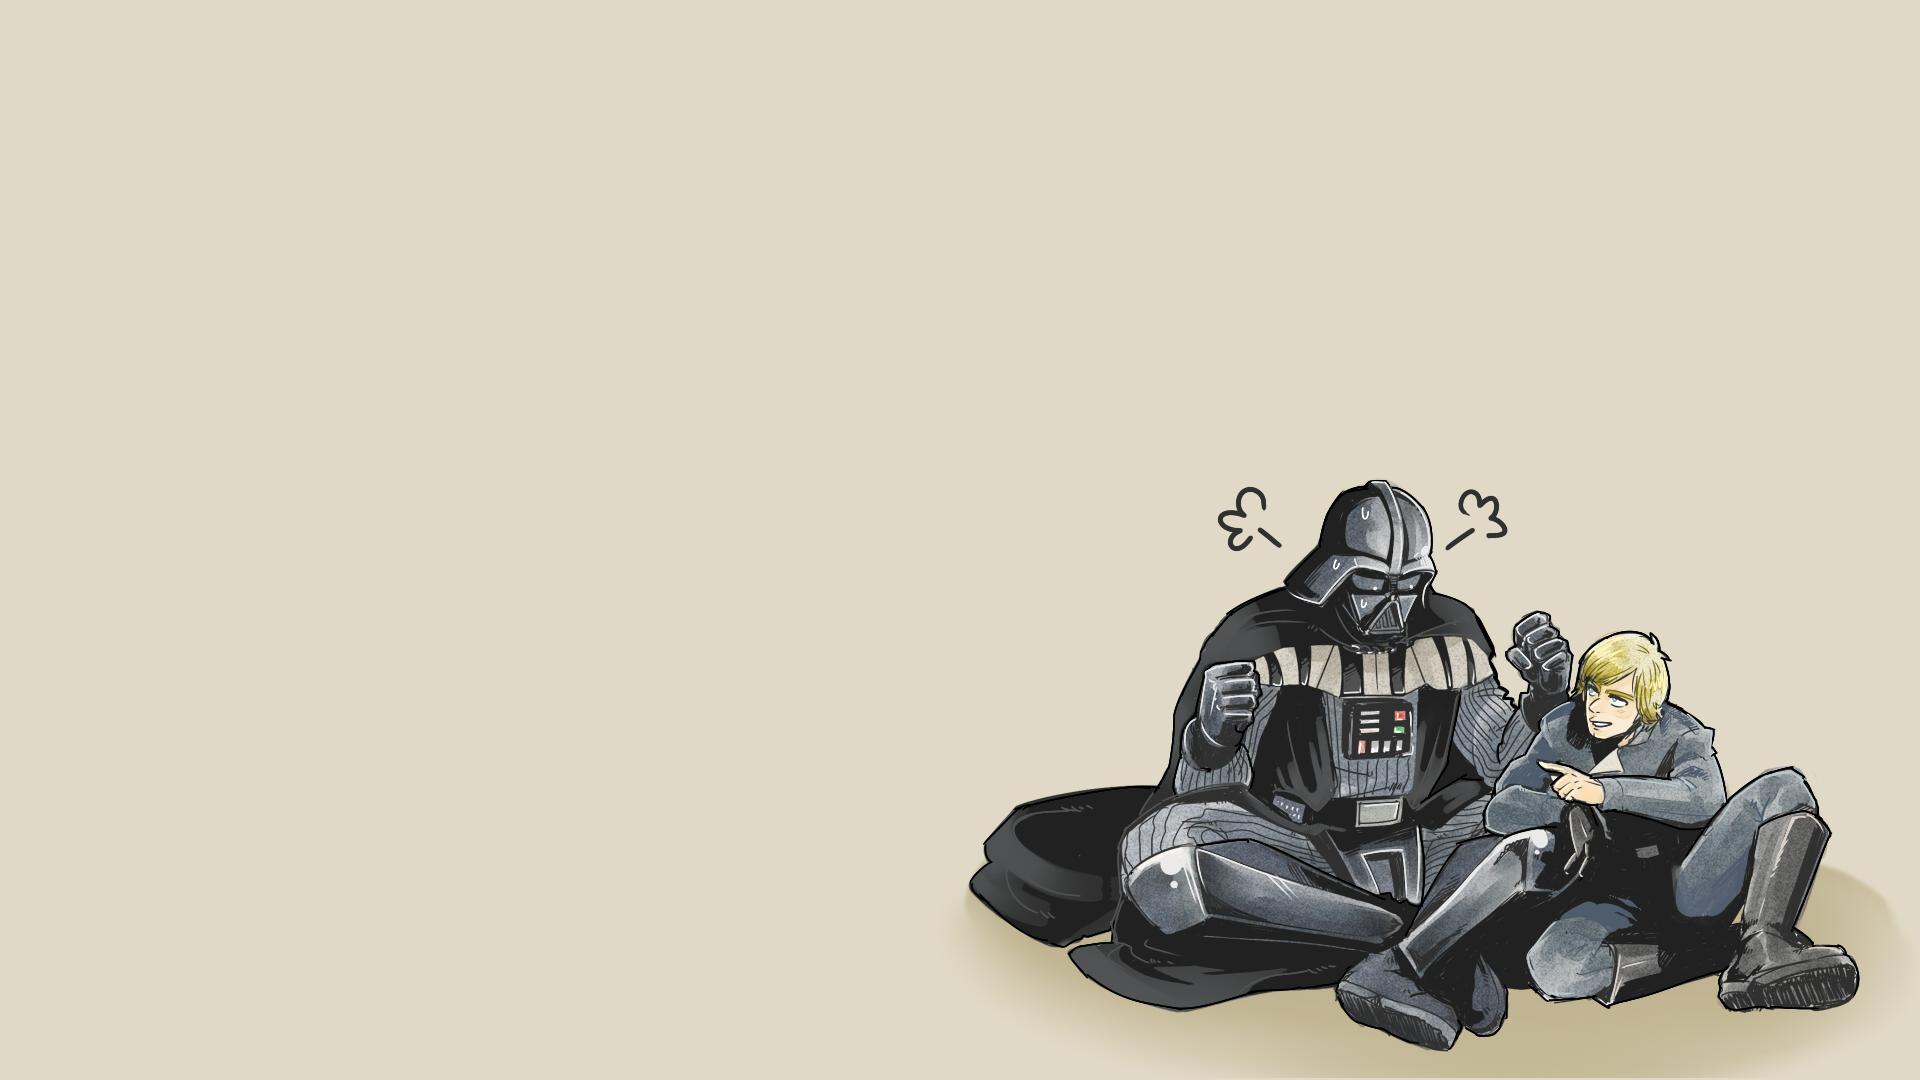 Wallpaper Illustration Star Wars Simple Background Vehicle